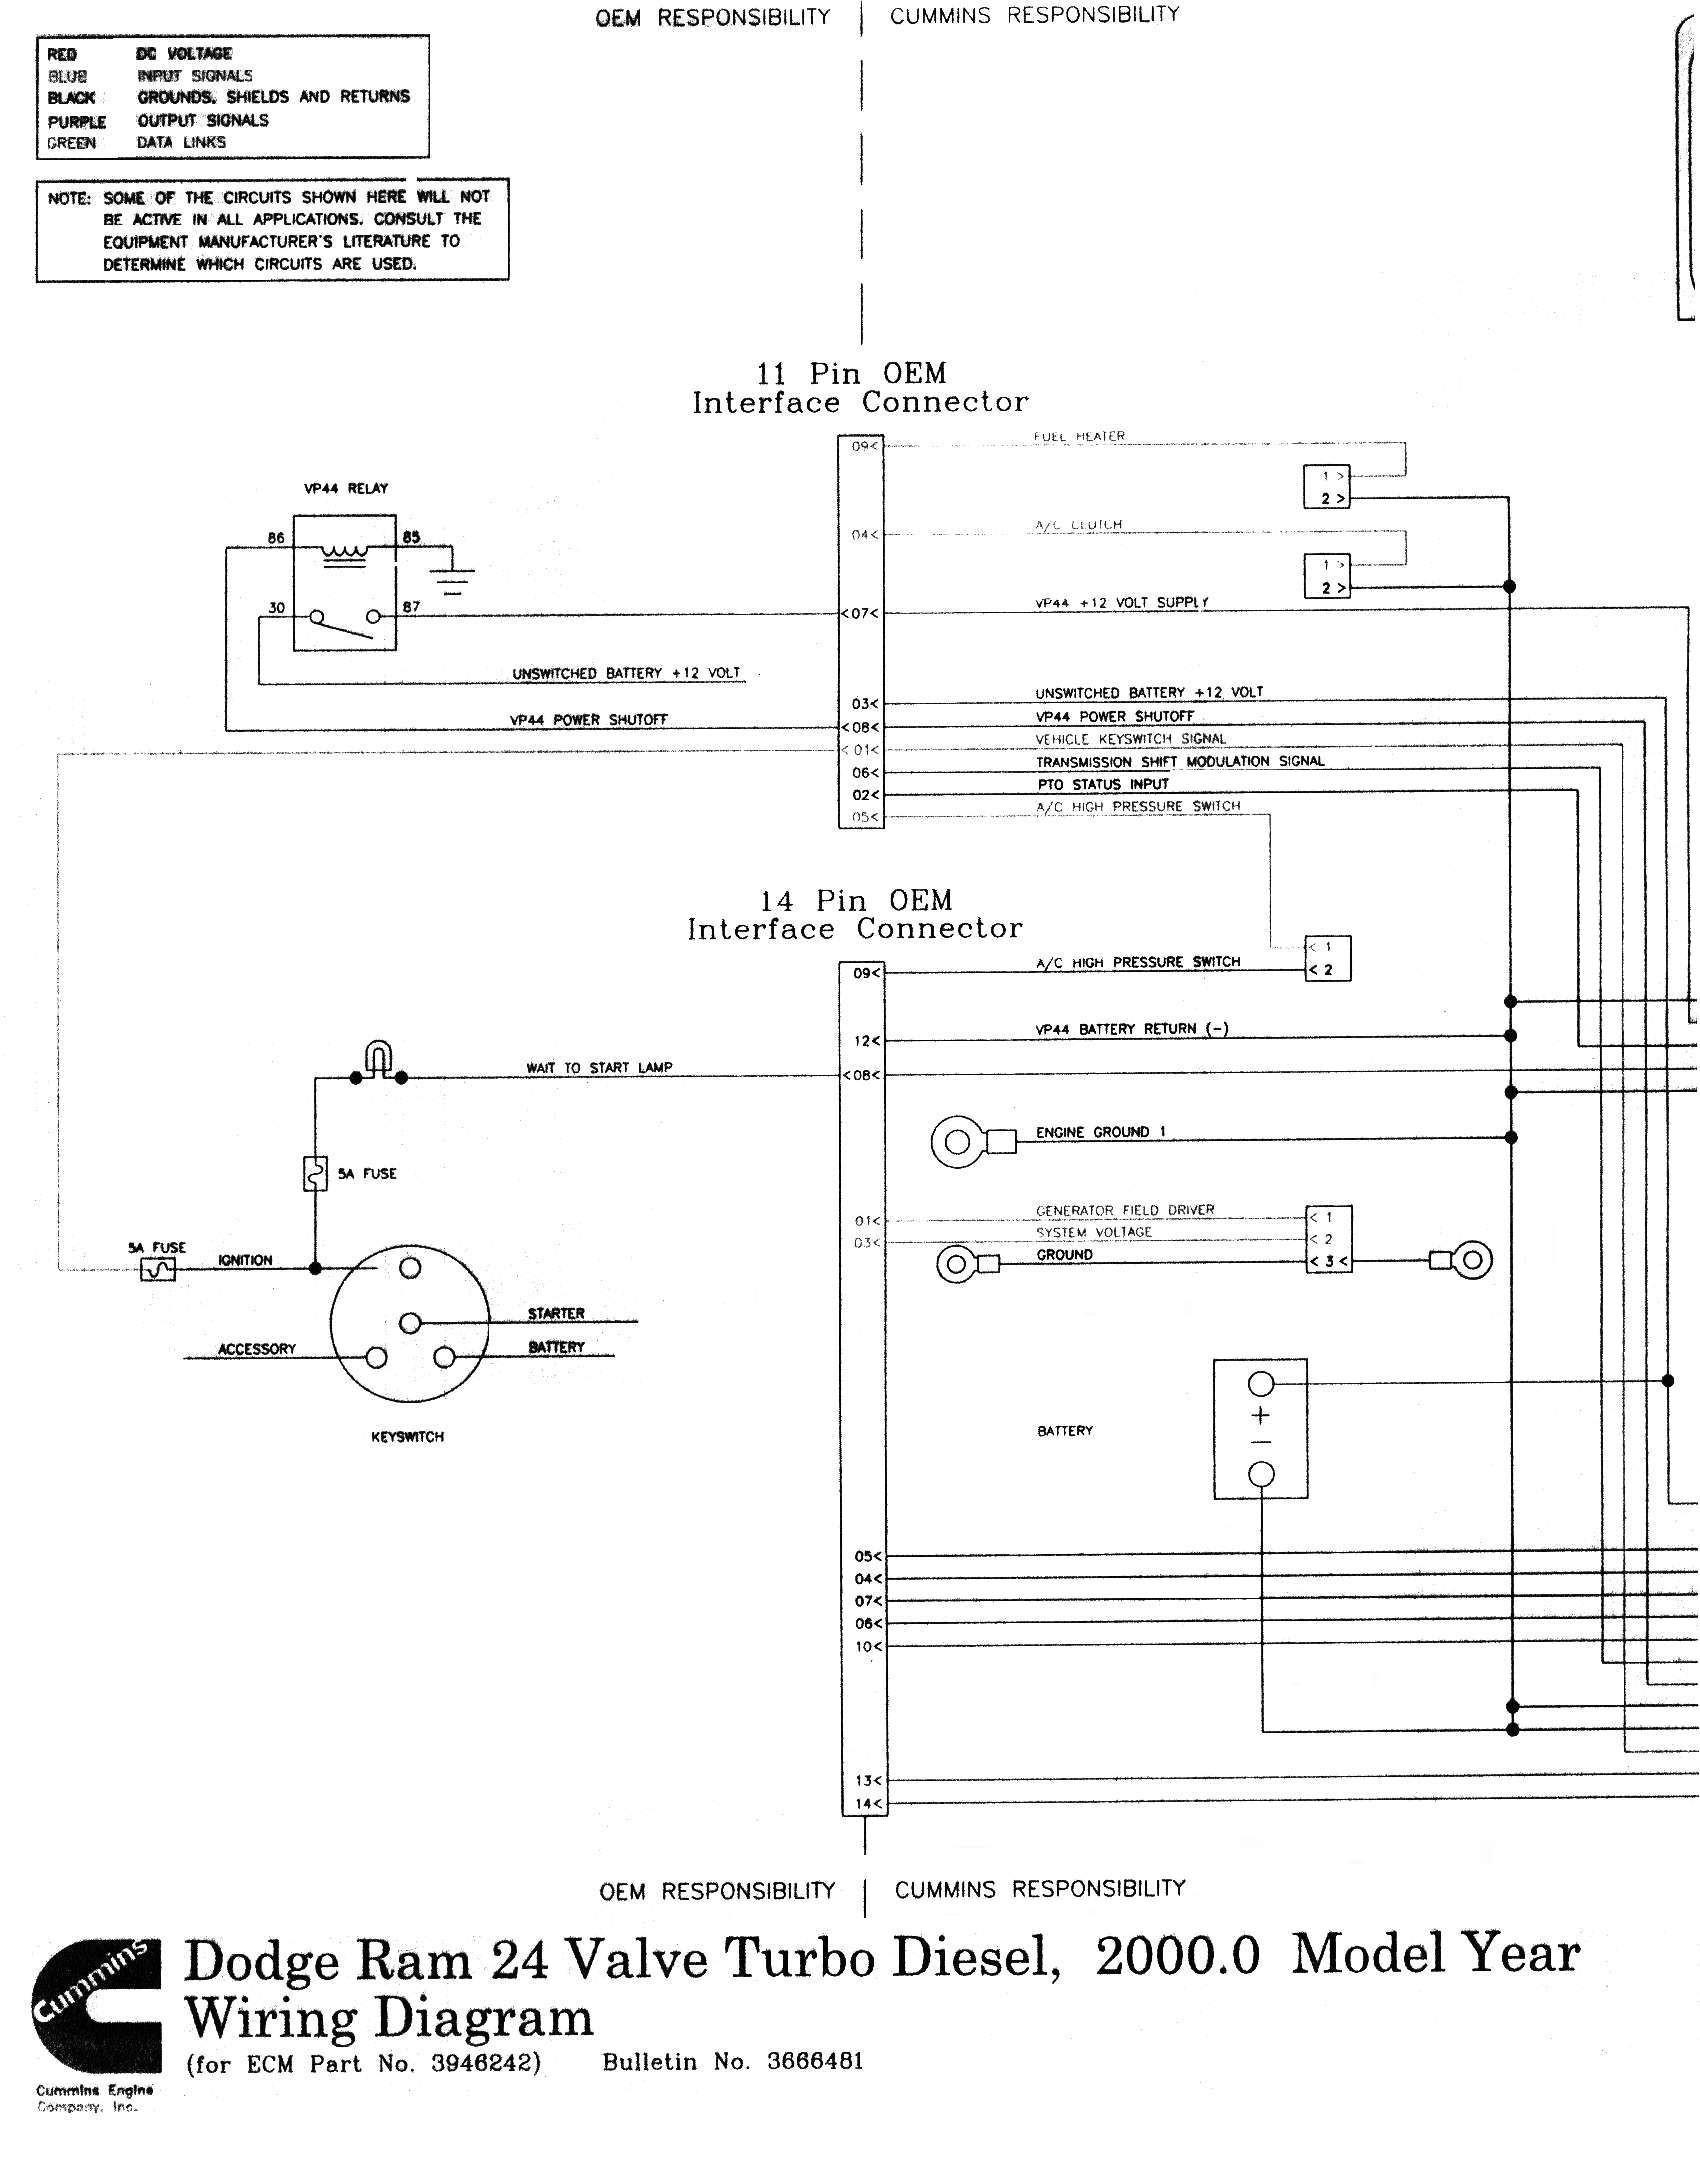 xsvi 6502 nav wiring diagram Download-Full Size of Wiring Diagram Dodge Ram Pcm Wiring Diagram New Ecm Details For Trucks 19-p